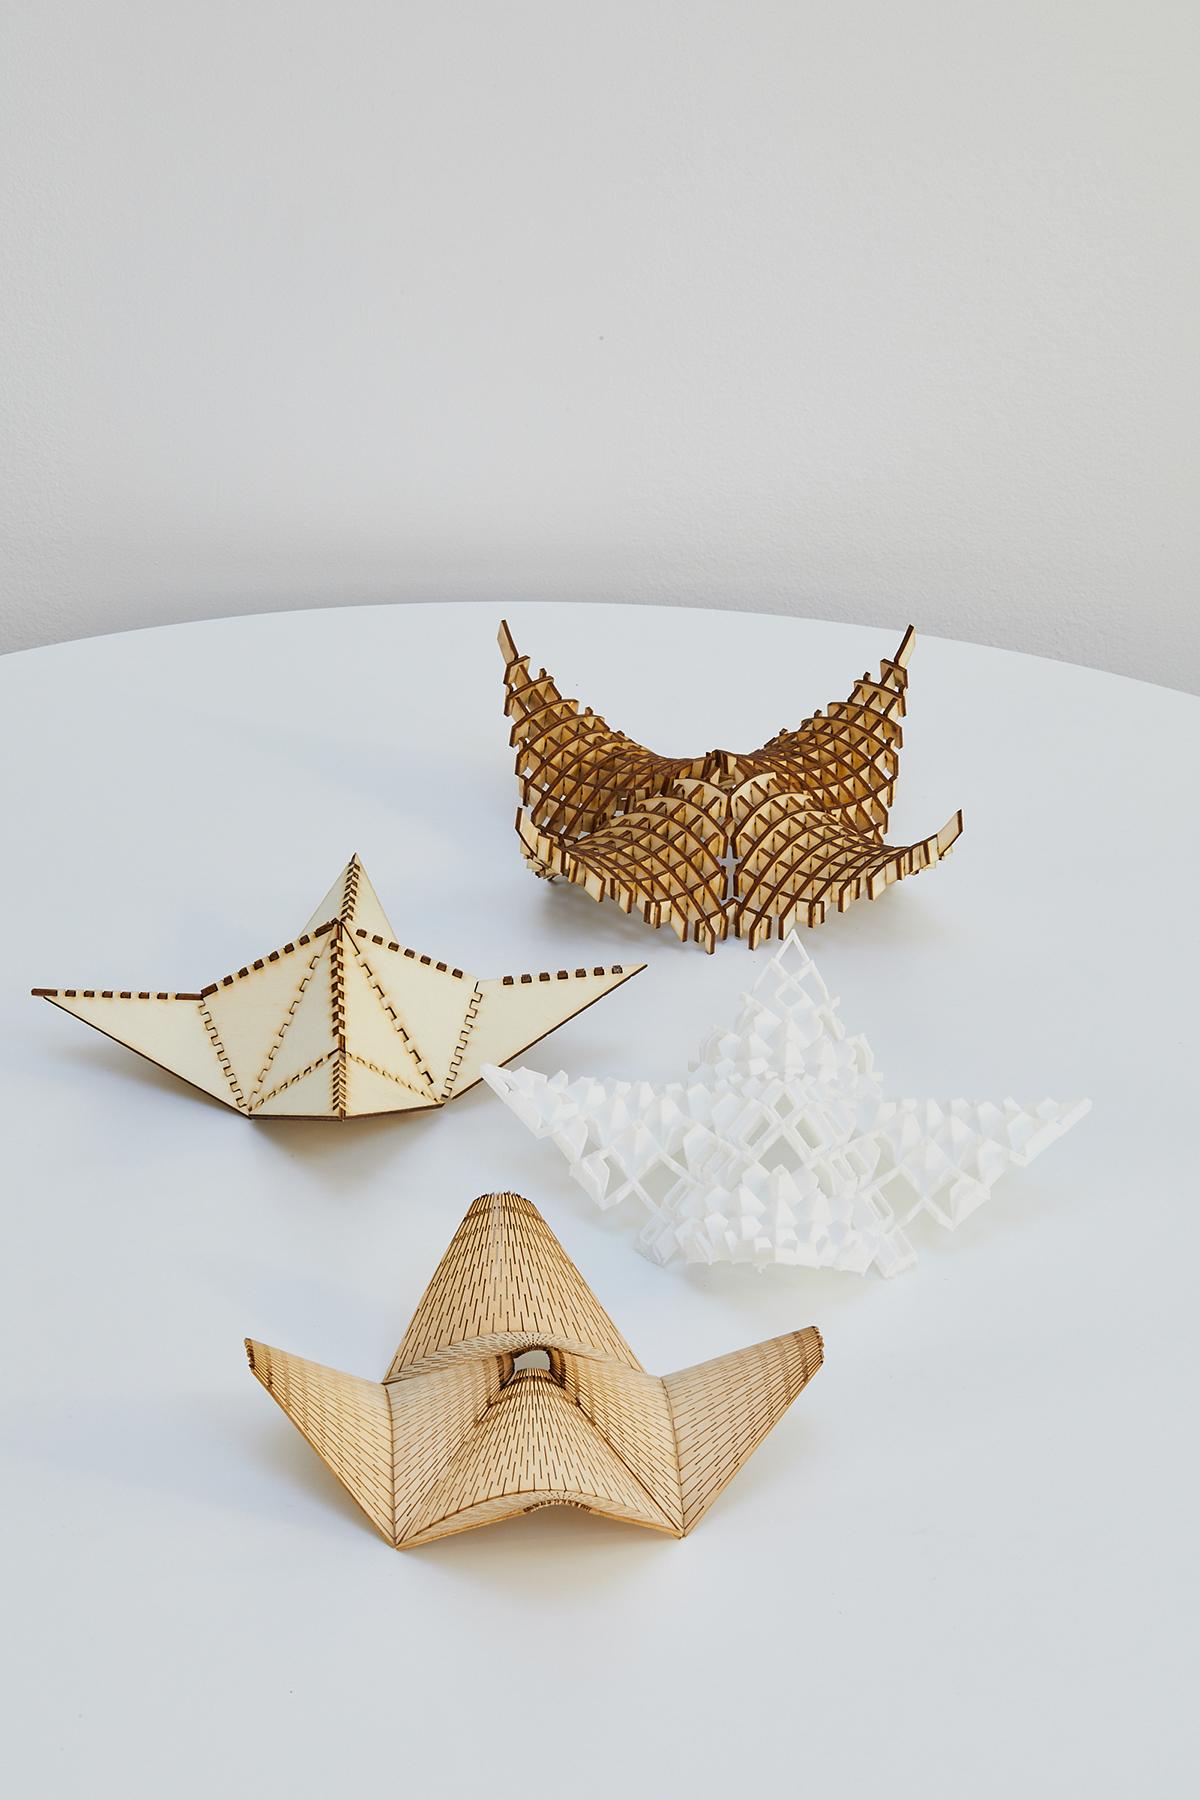 Sanishka Balasooriya Computational Design Studio 1